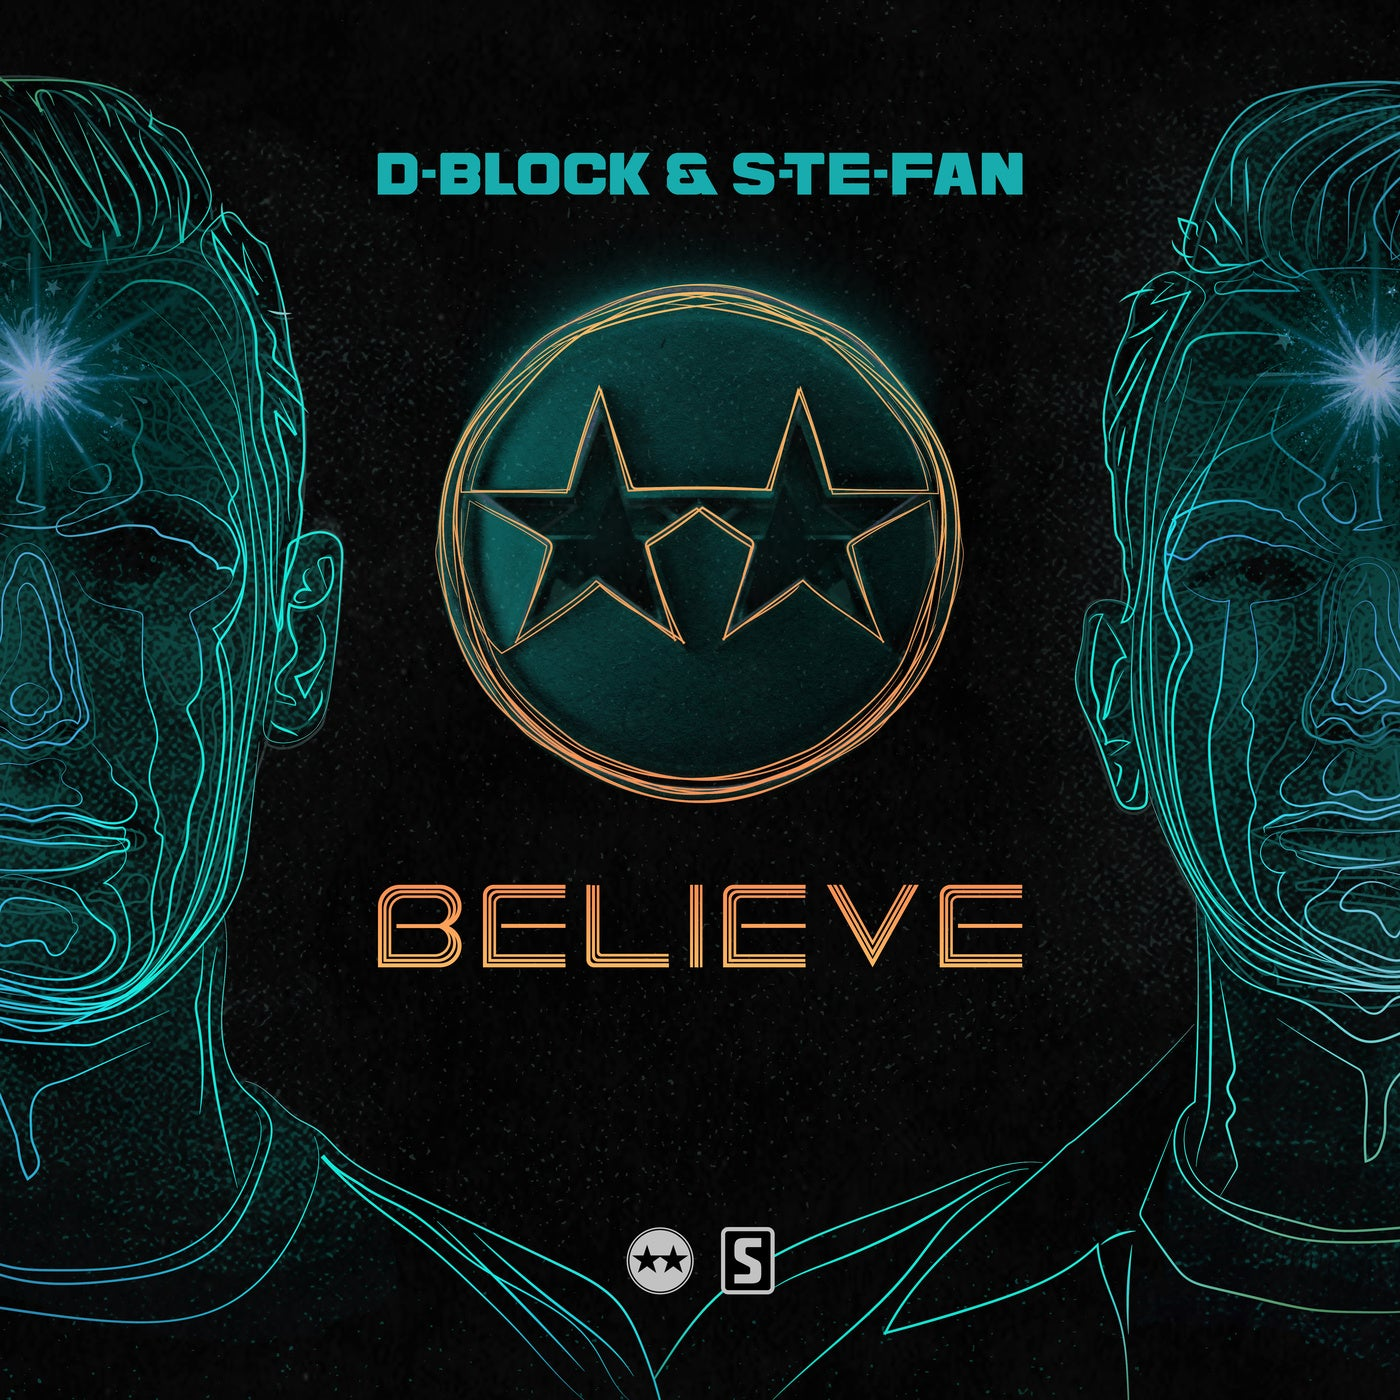 Believe (Original Mix)